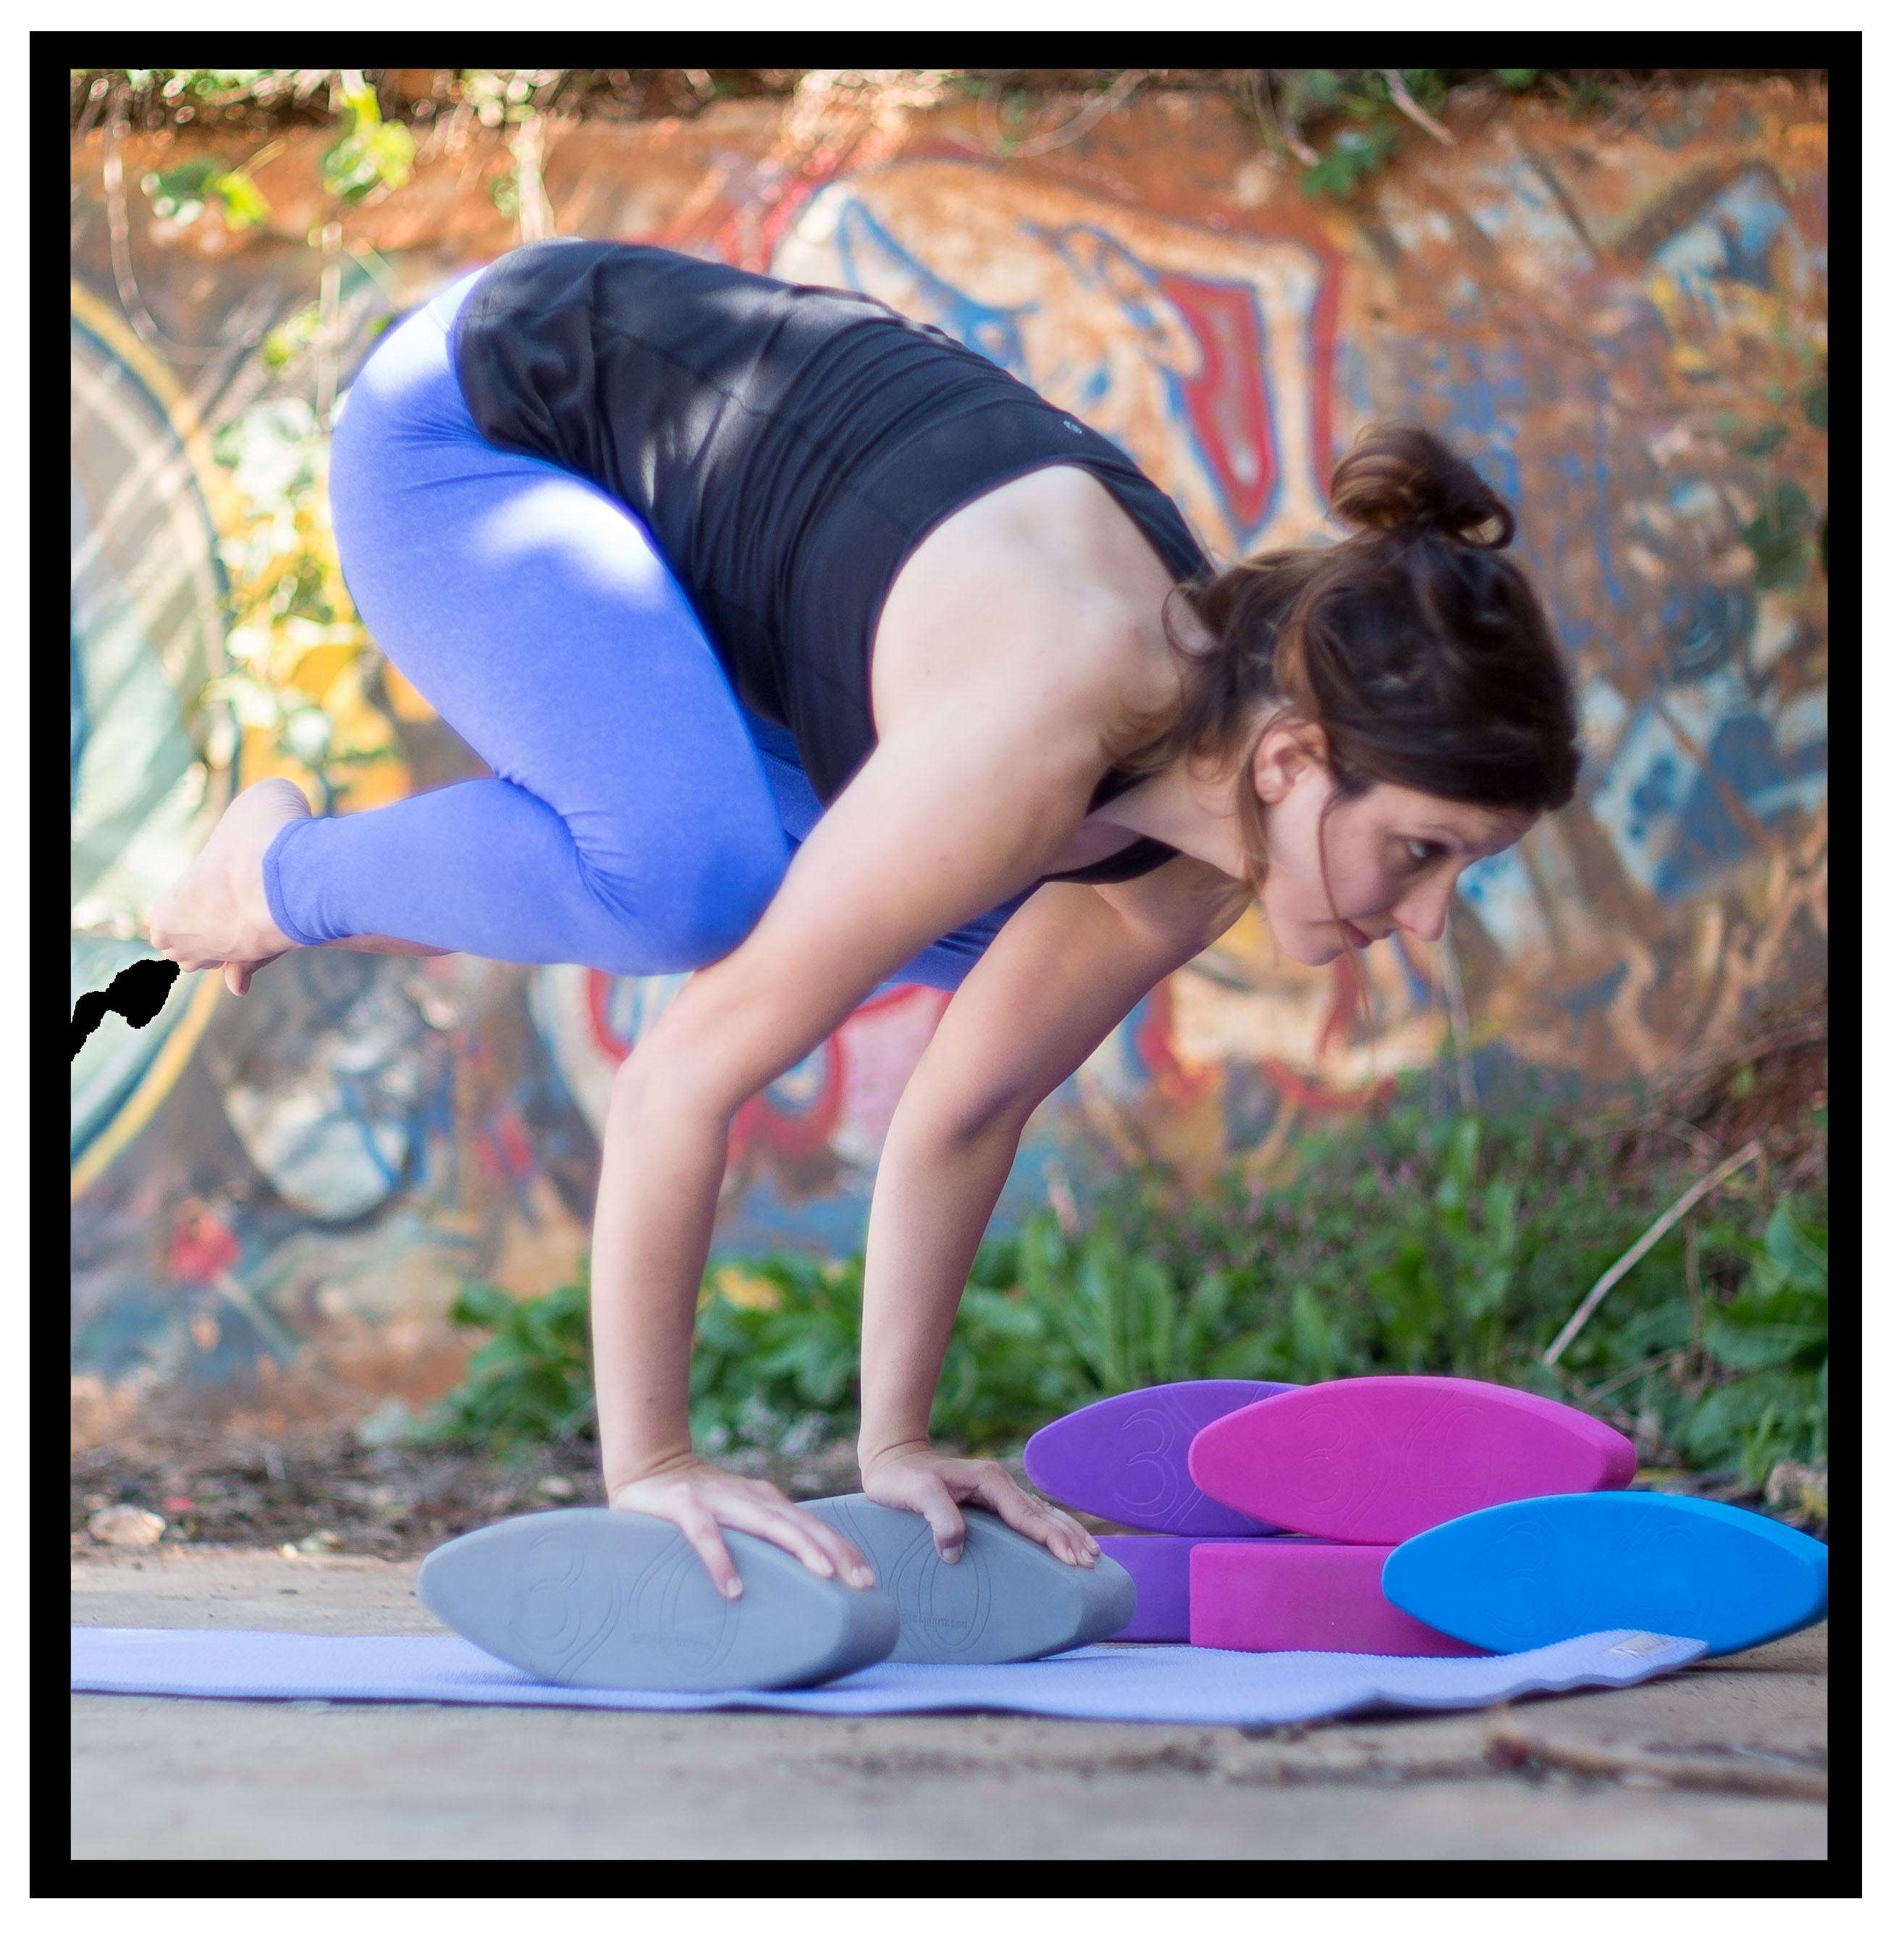 canada harmony dubai with from professional testimonials img integrative yoga jade february kreg training mats teacher hatha weiss mat